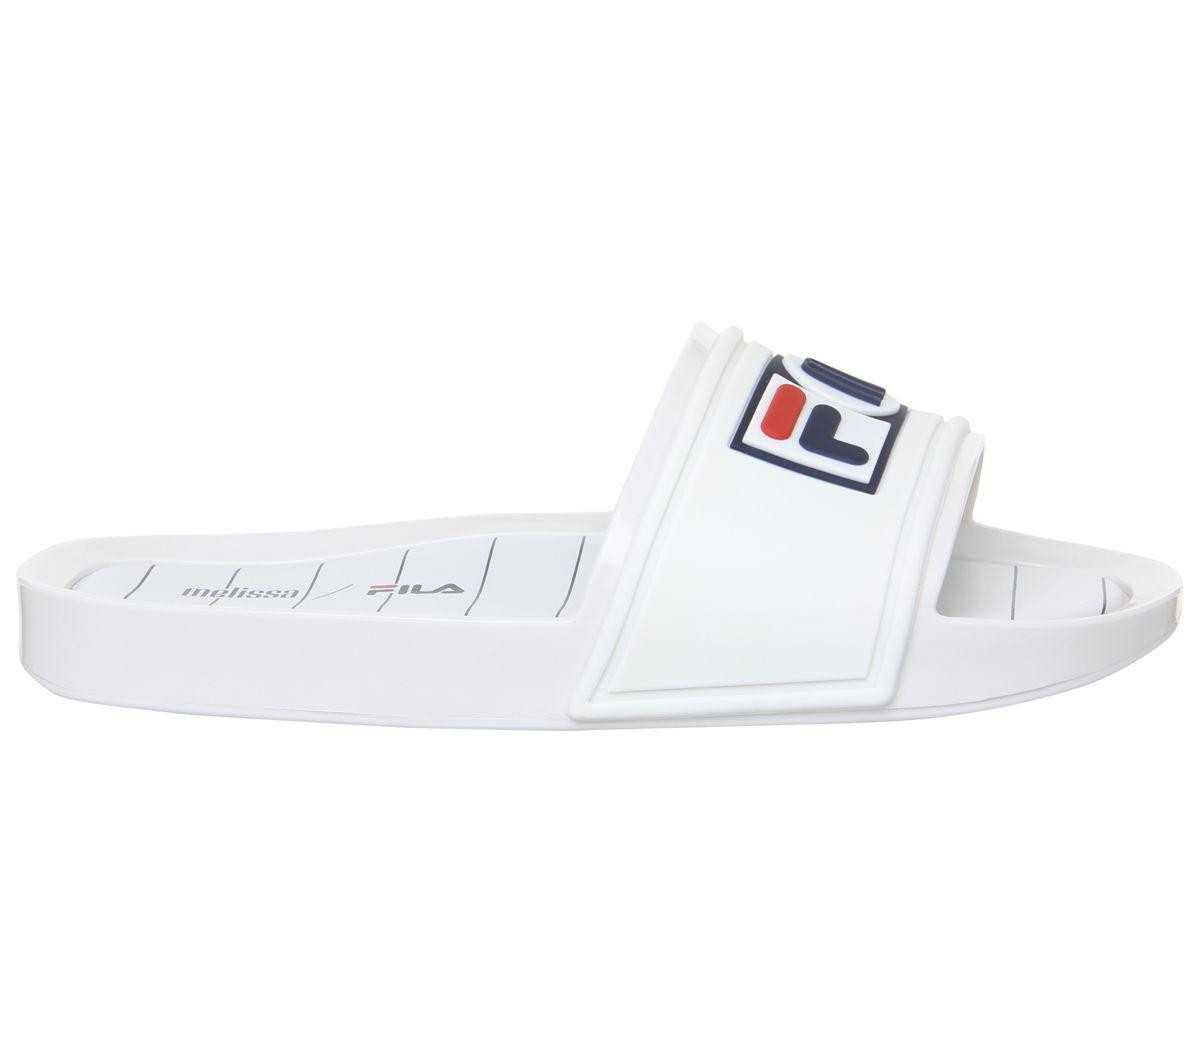 f70194bd7d2d Melissa Melissa Slide + Fila Sandals White - Sandals